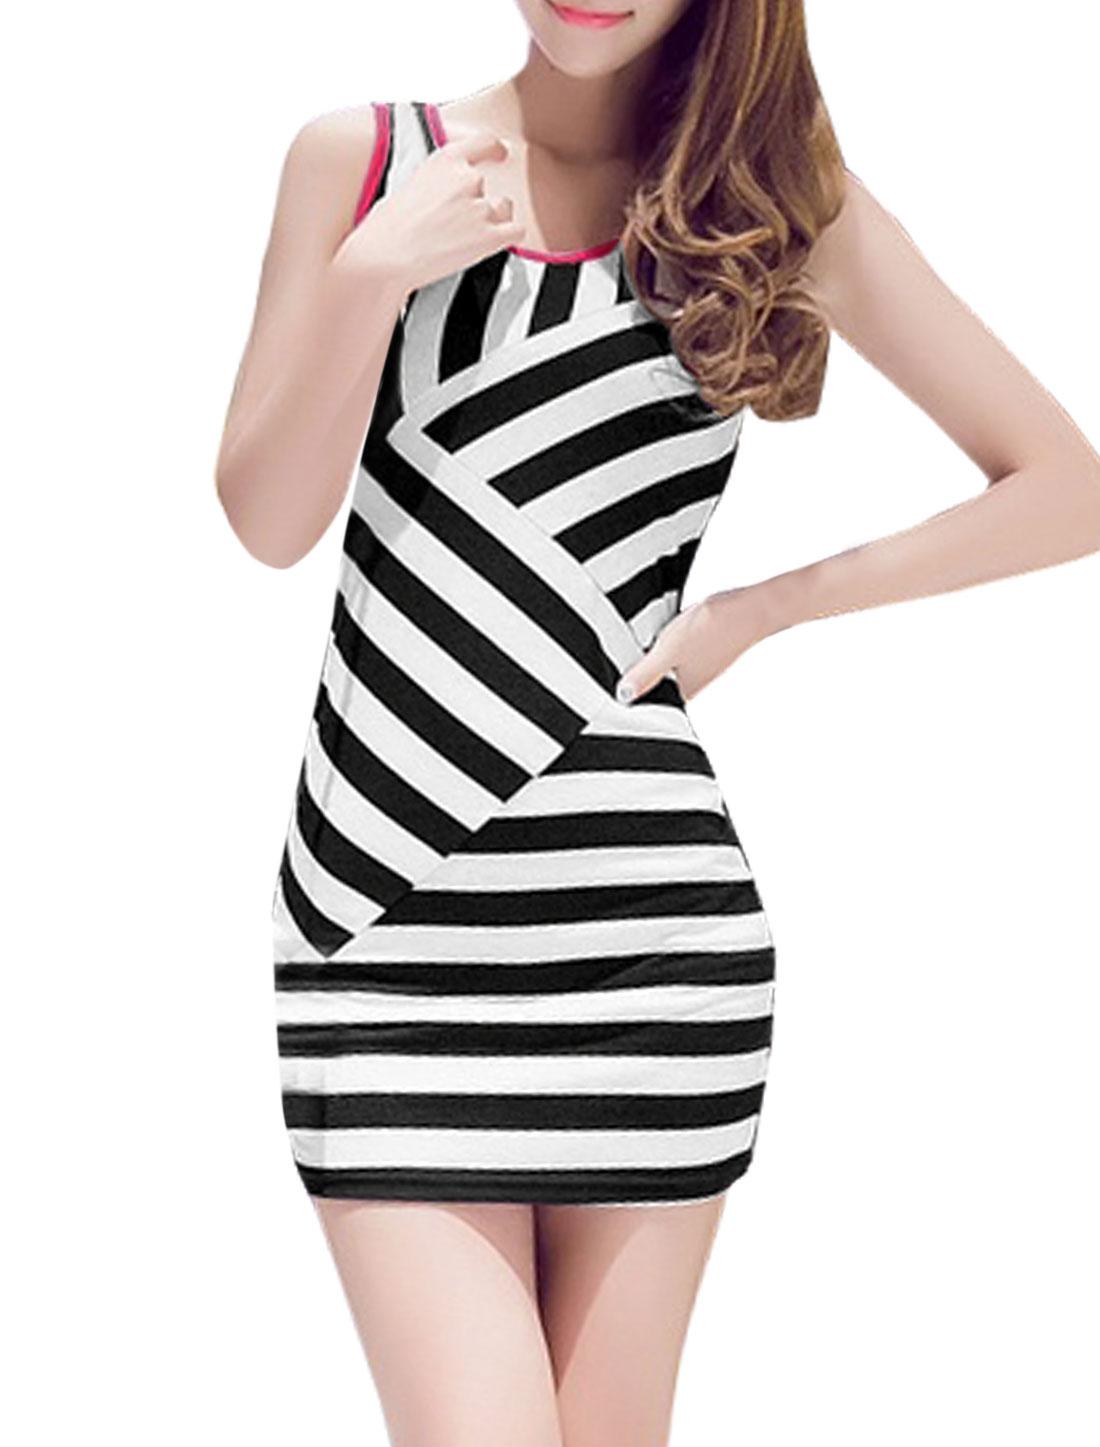 Women Scoop Neck Sleeveless Stripes Slim Fit Wiggle Dress Fuchsia Black XS